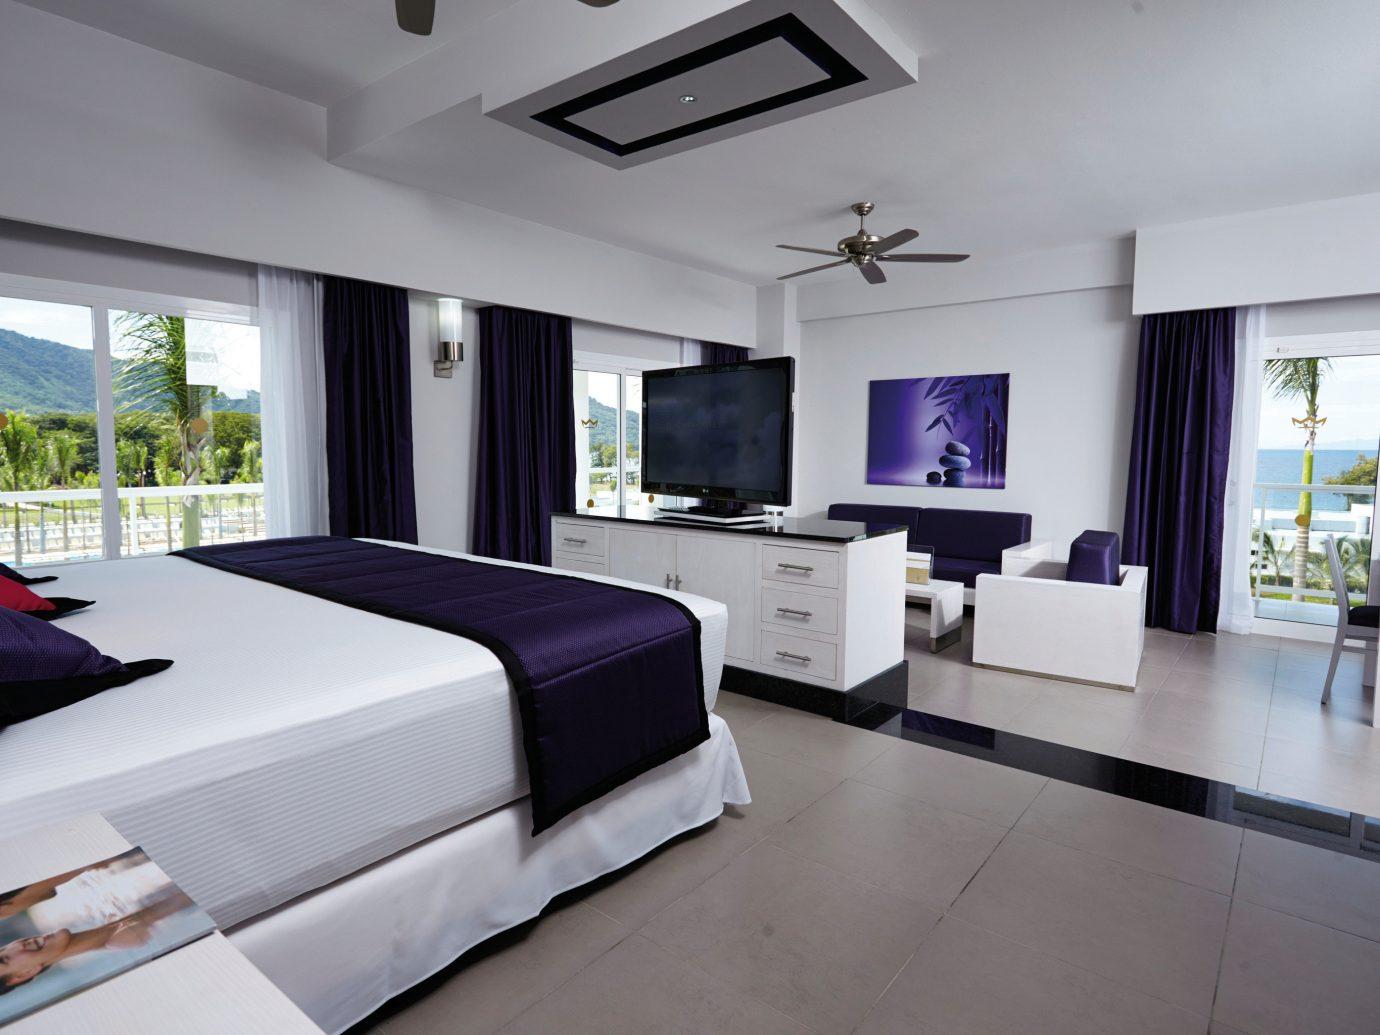 Bedroom at Hotel Riu Palace Costa Rica, Guanacaste